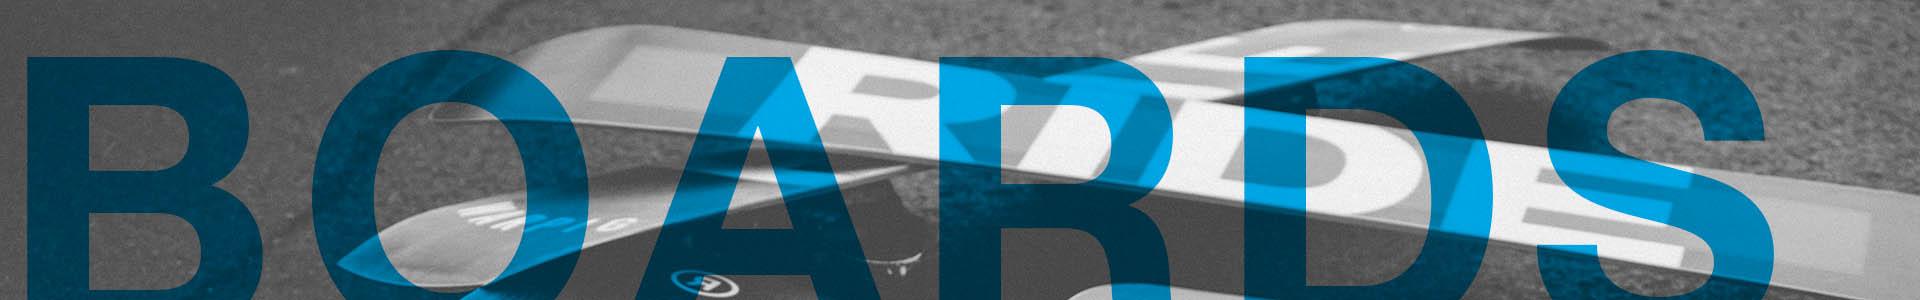 snowboard-snowboards-1920x300.jpg